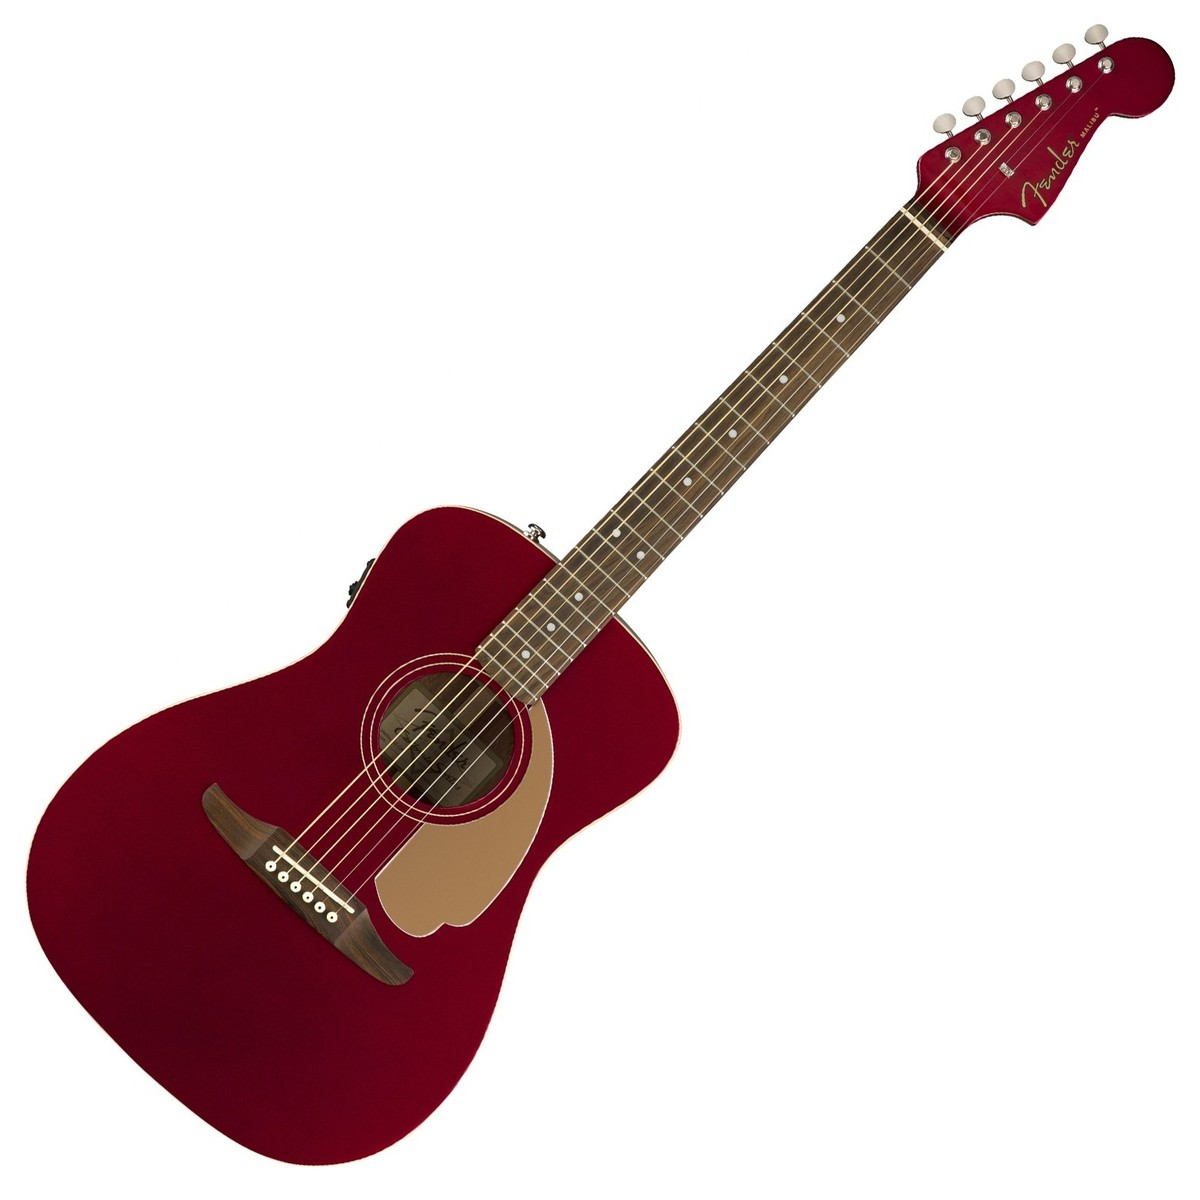 Fender Malibu Player Candy Apple Red WN elektro-akustinė gitara